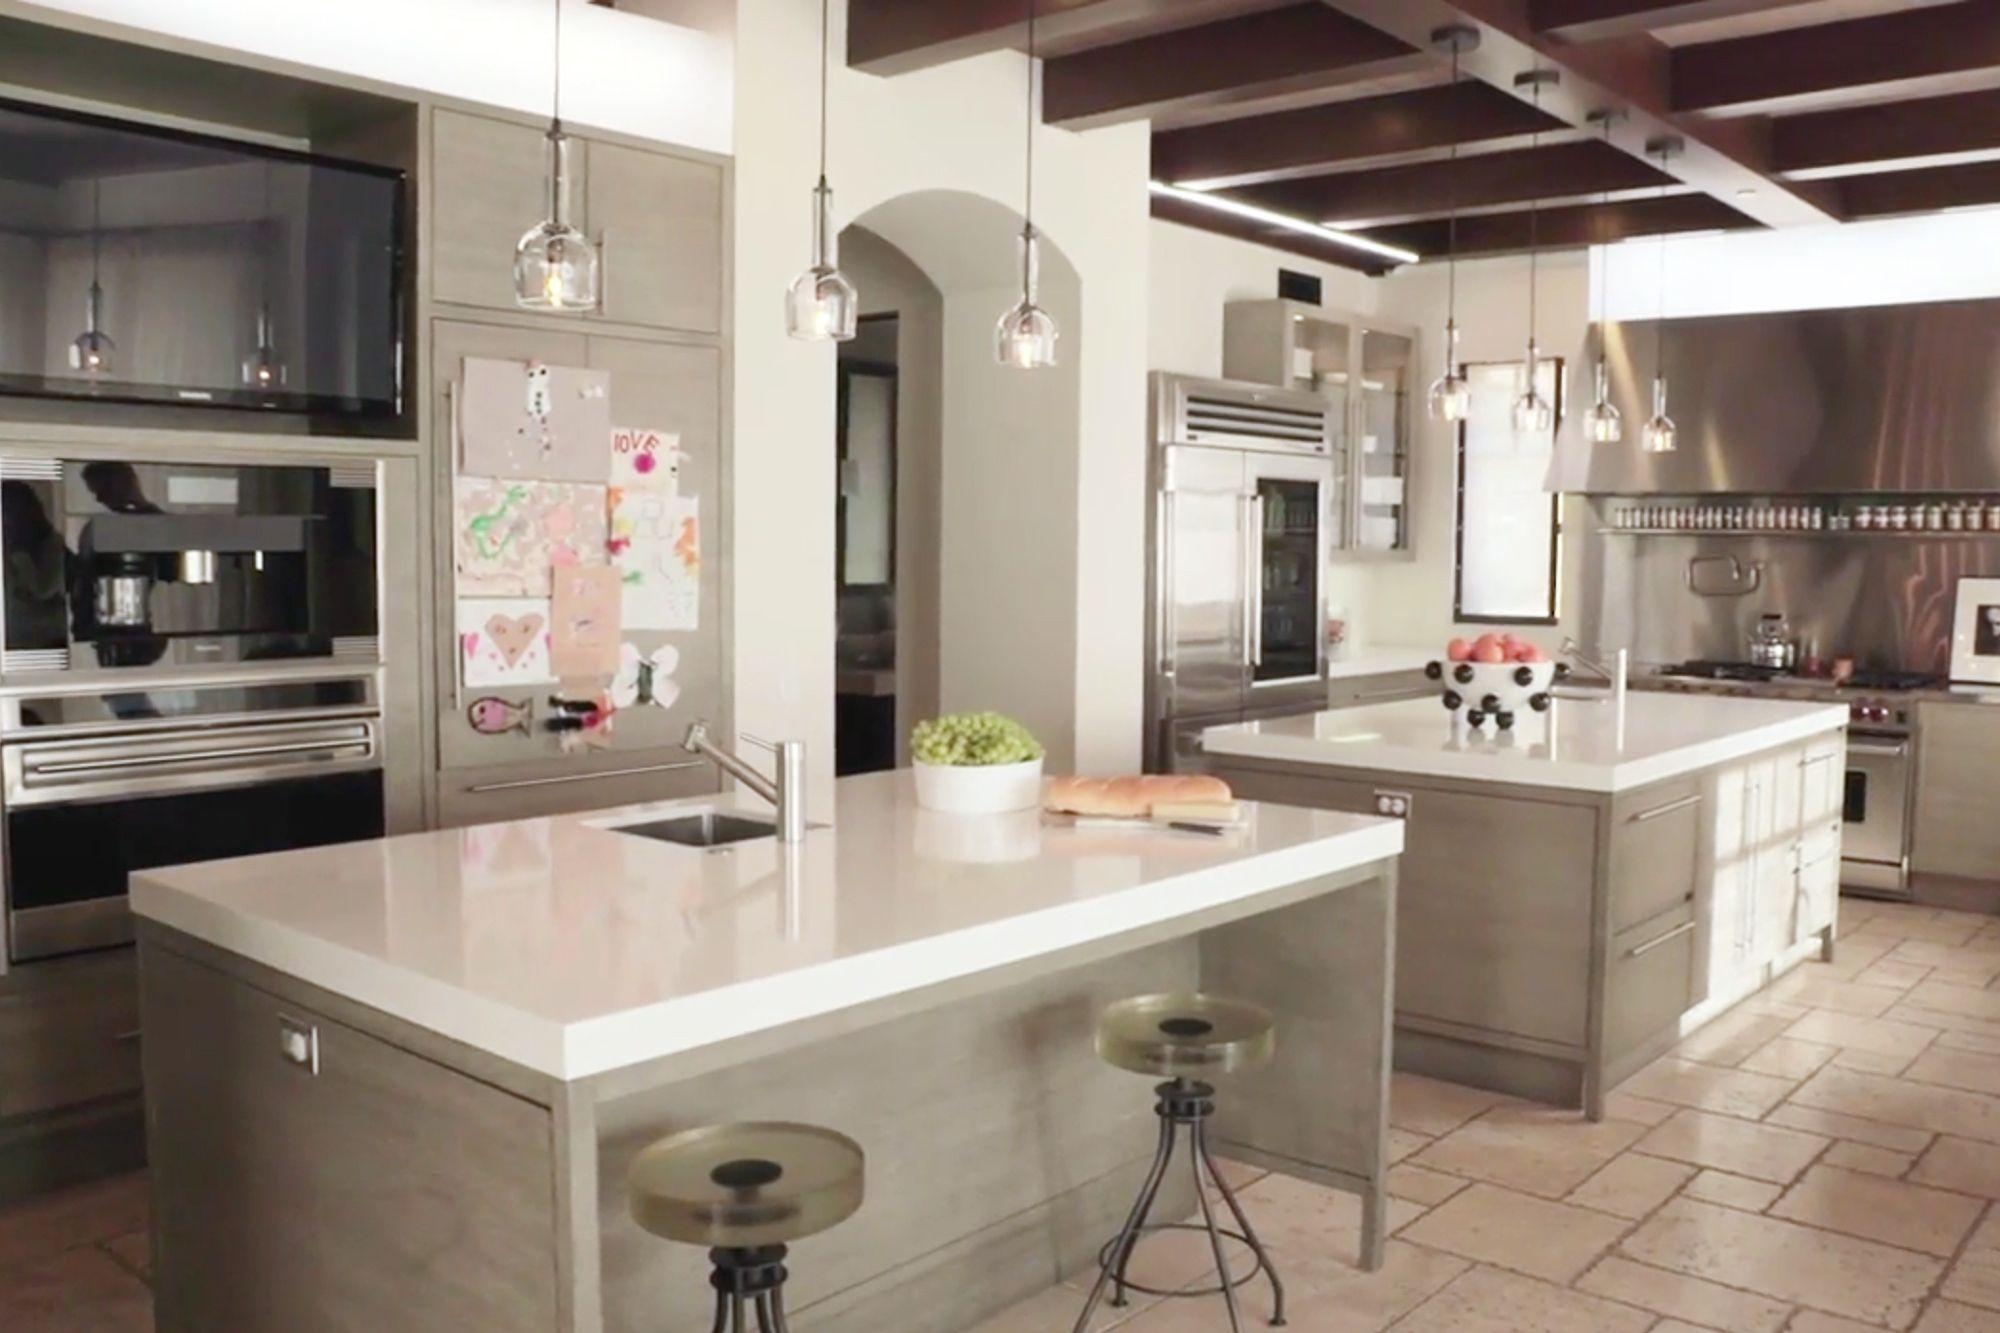 Kourtney Kardashian Kitchen And Living Room Kardashian Kitchen Decor Kourtney Kardashian House Luxury Kitchens